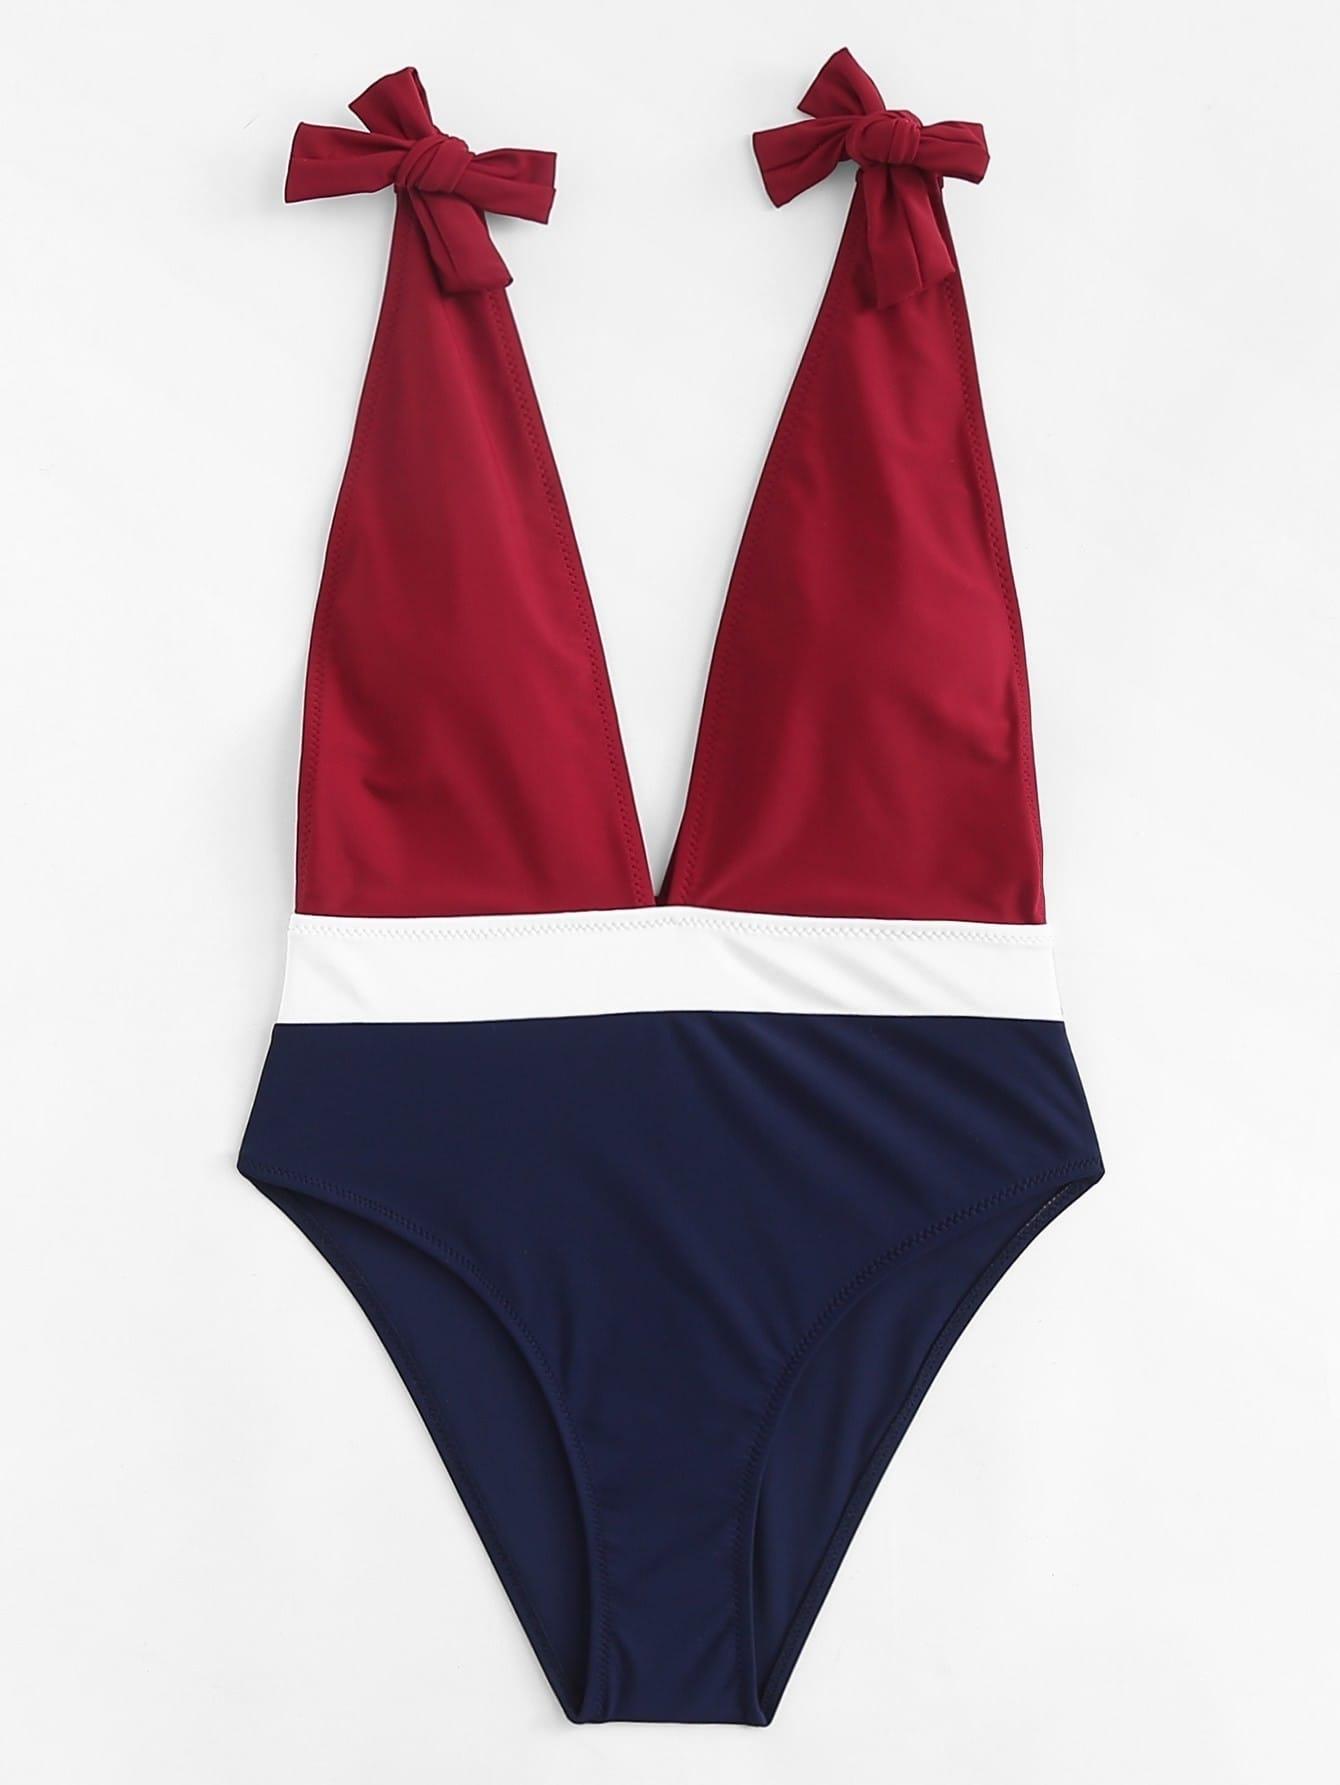 V Plunge Colorblock Swimsuit swimwear180316315